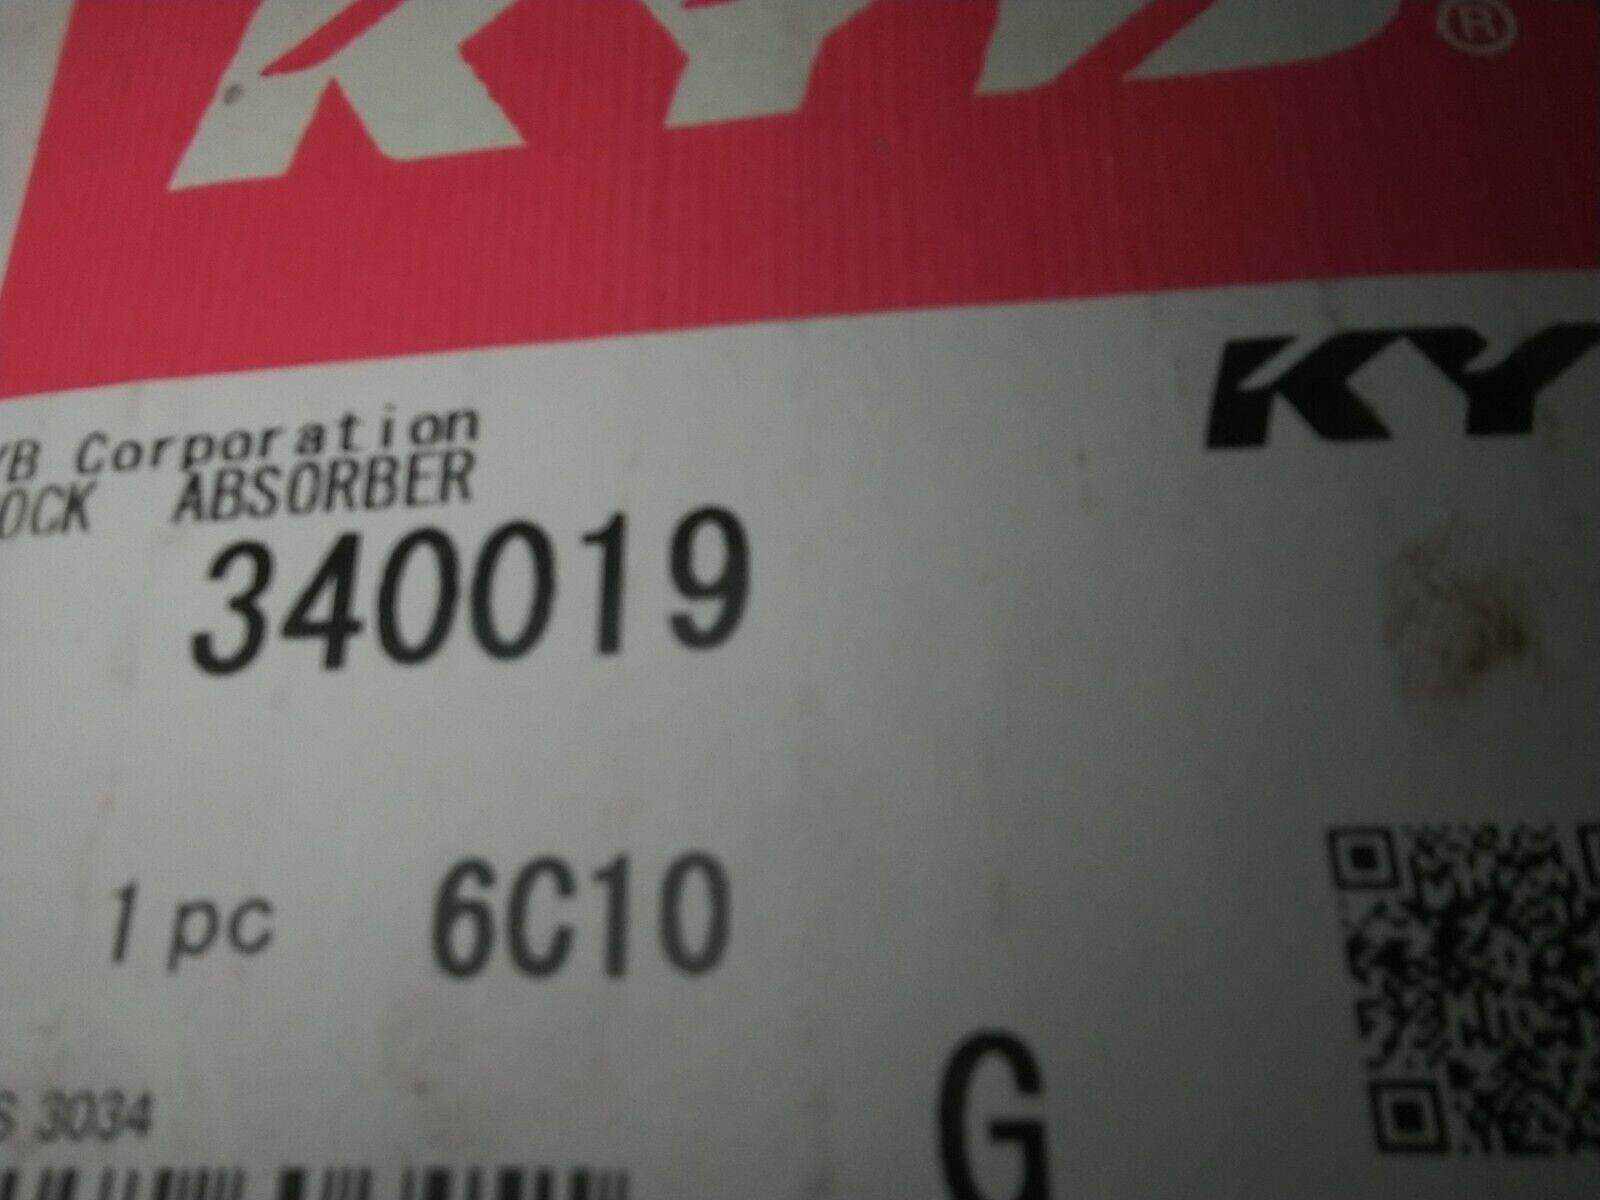 KYB 340019 Excel-G Gas Strut